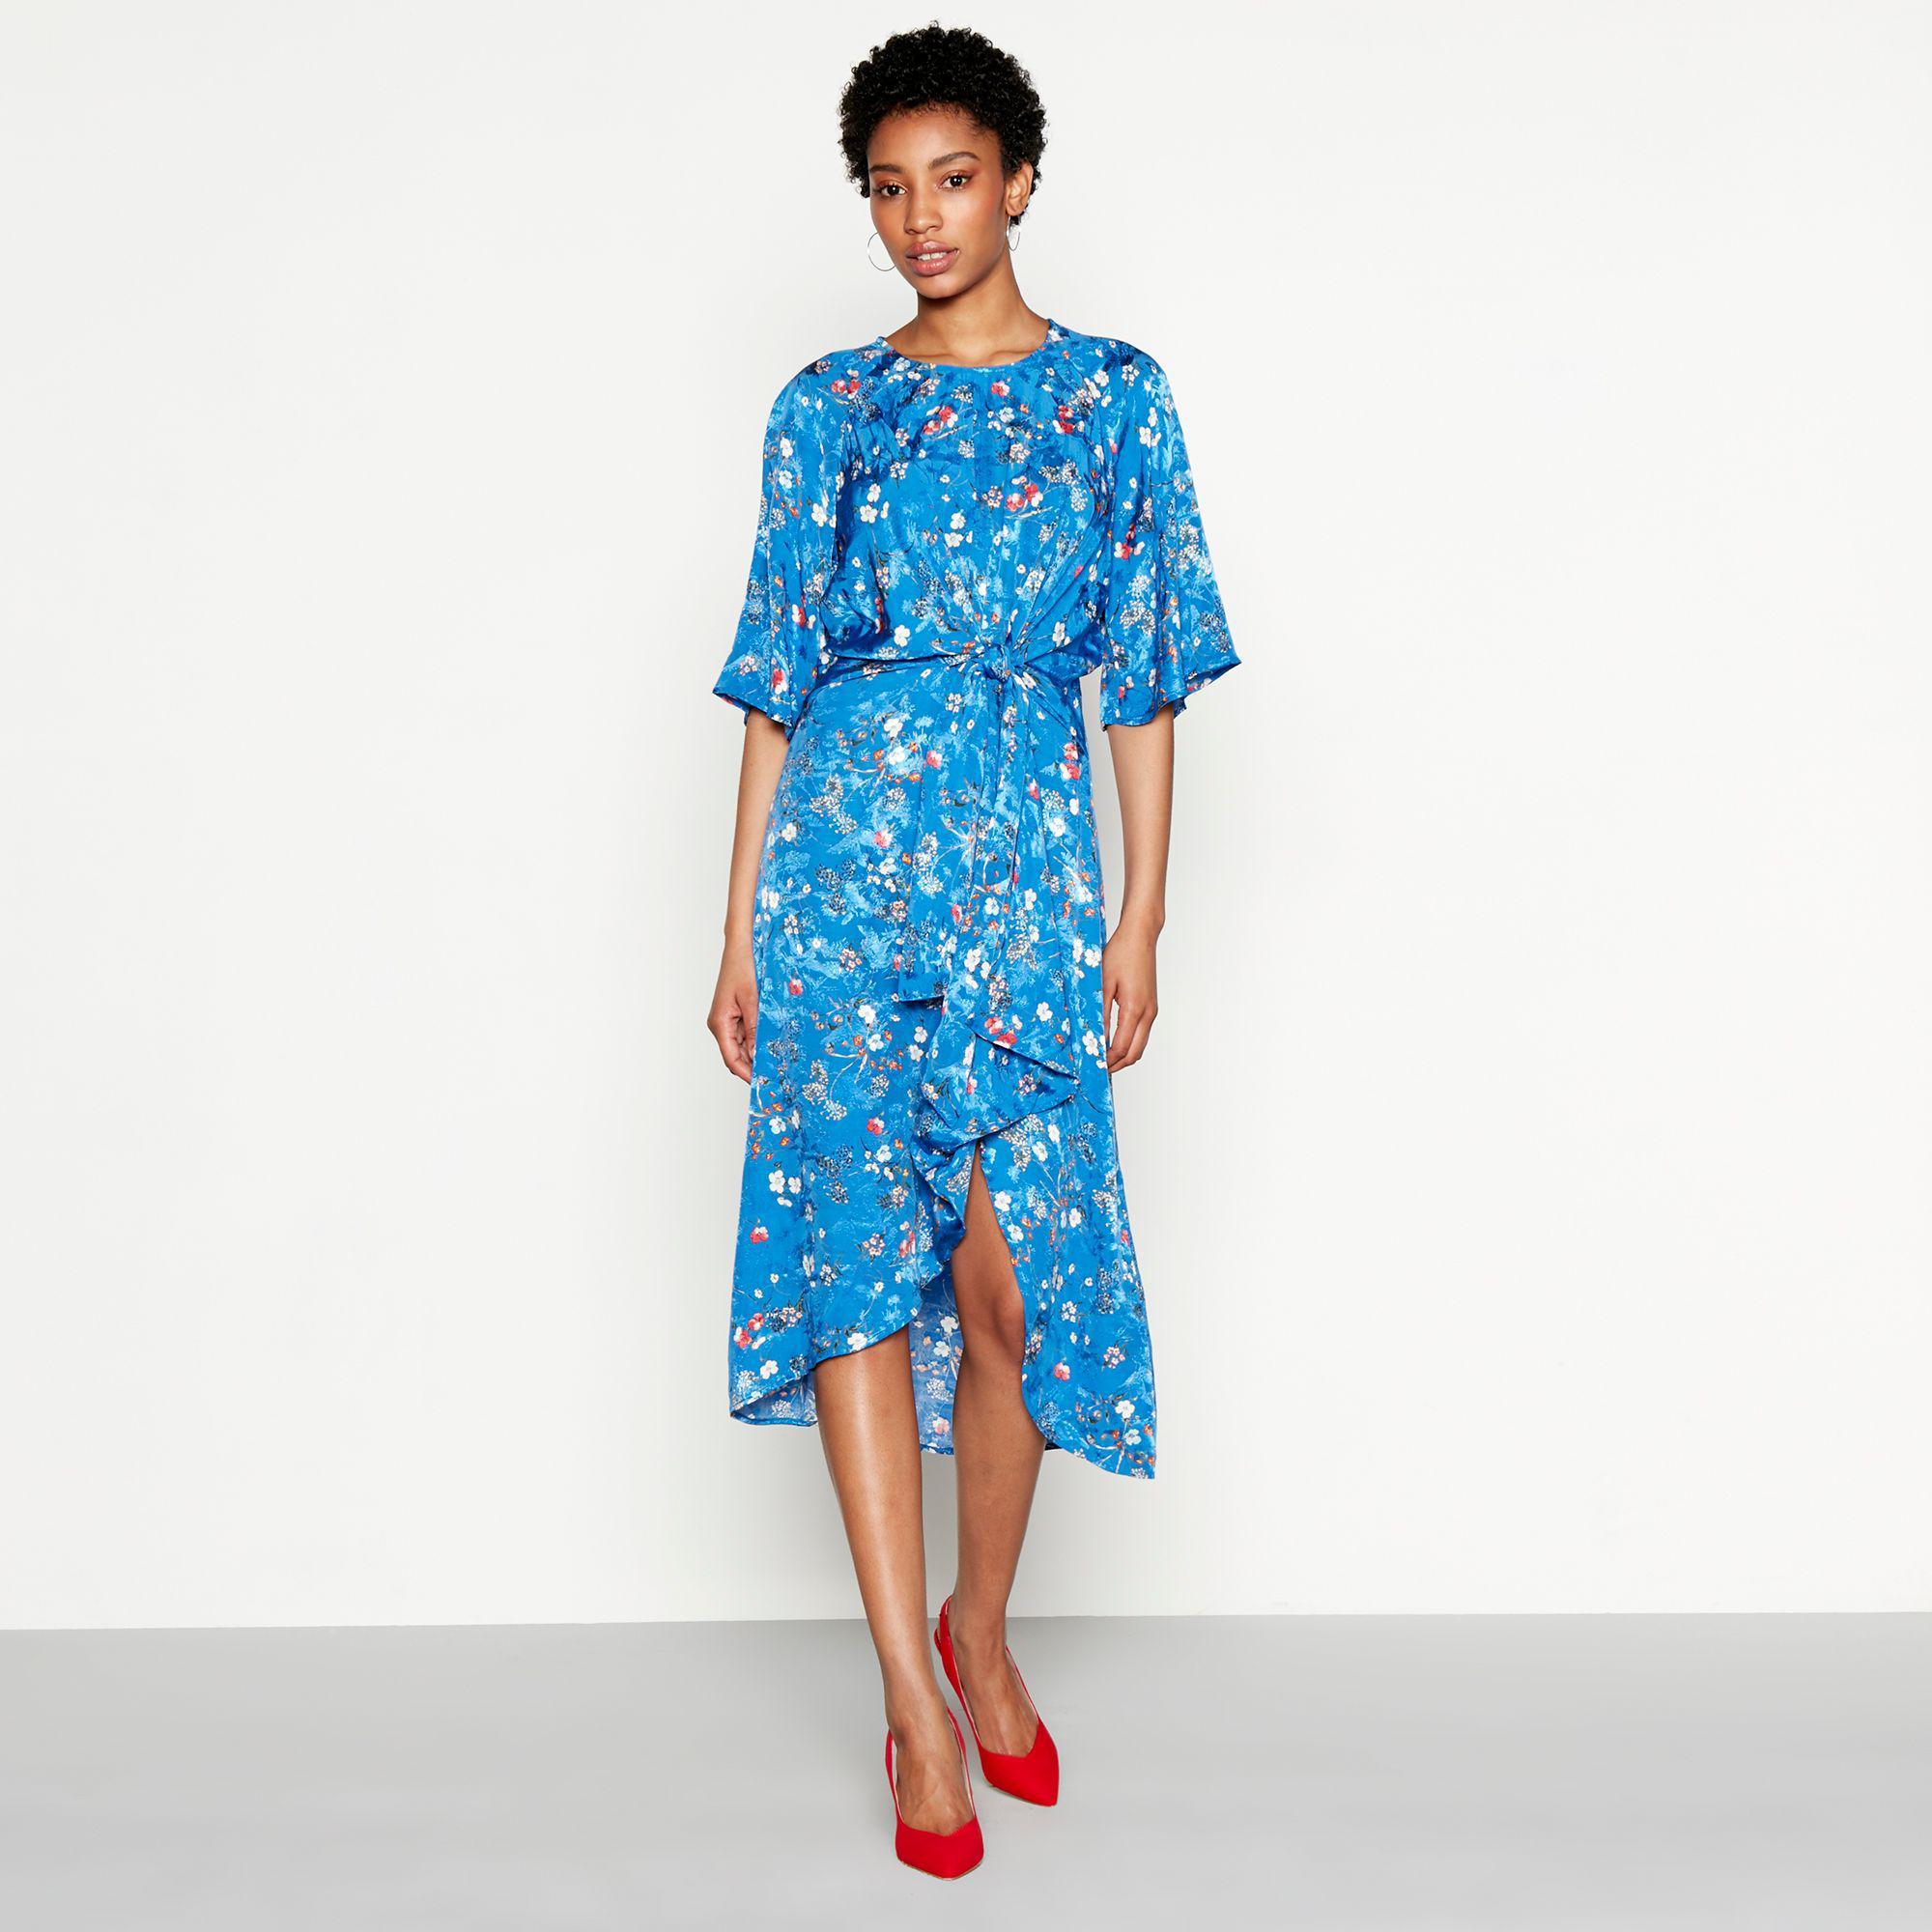 Enchanting Debenhams Prom Dress Model - Womens Dresses & Gowns ...